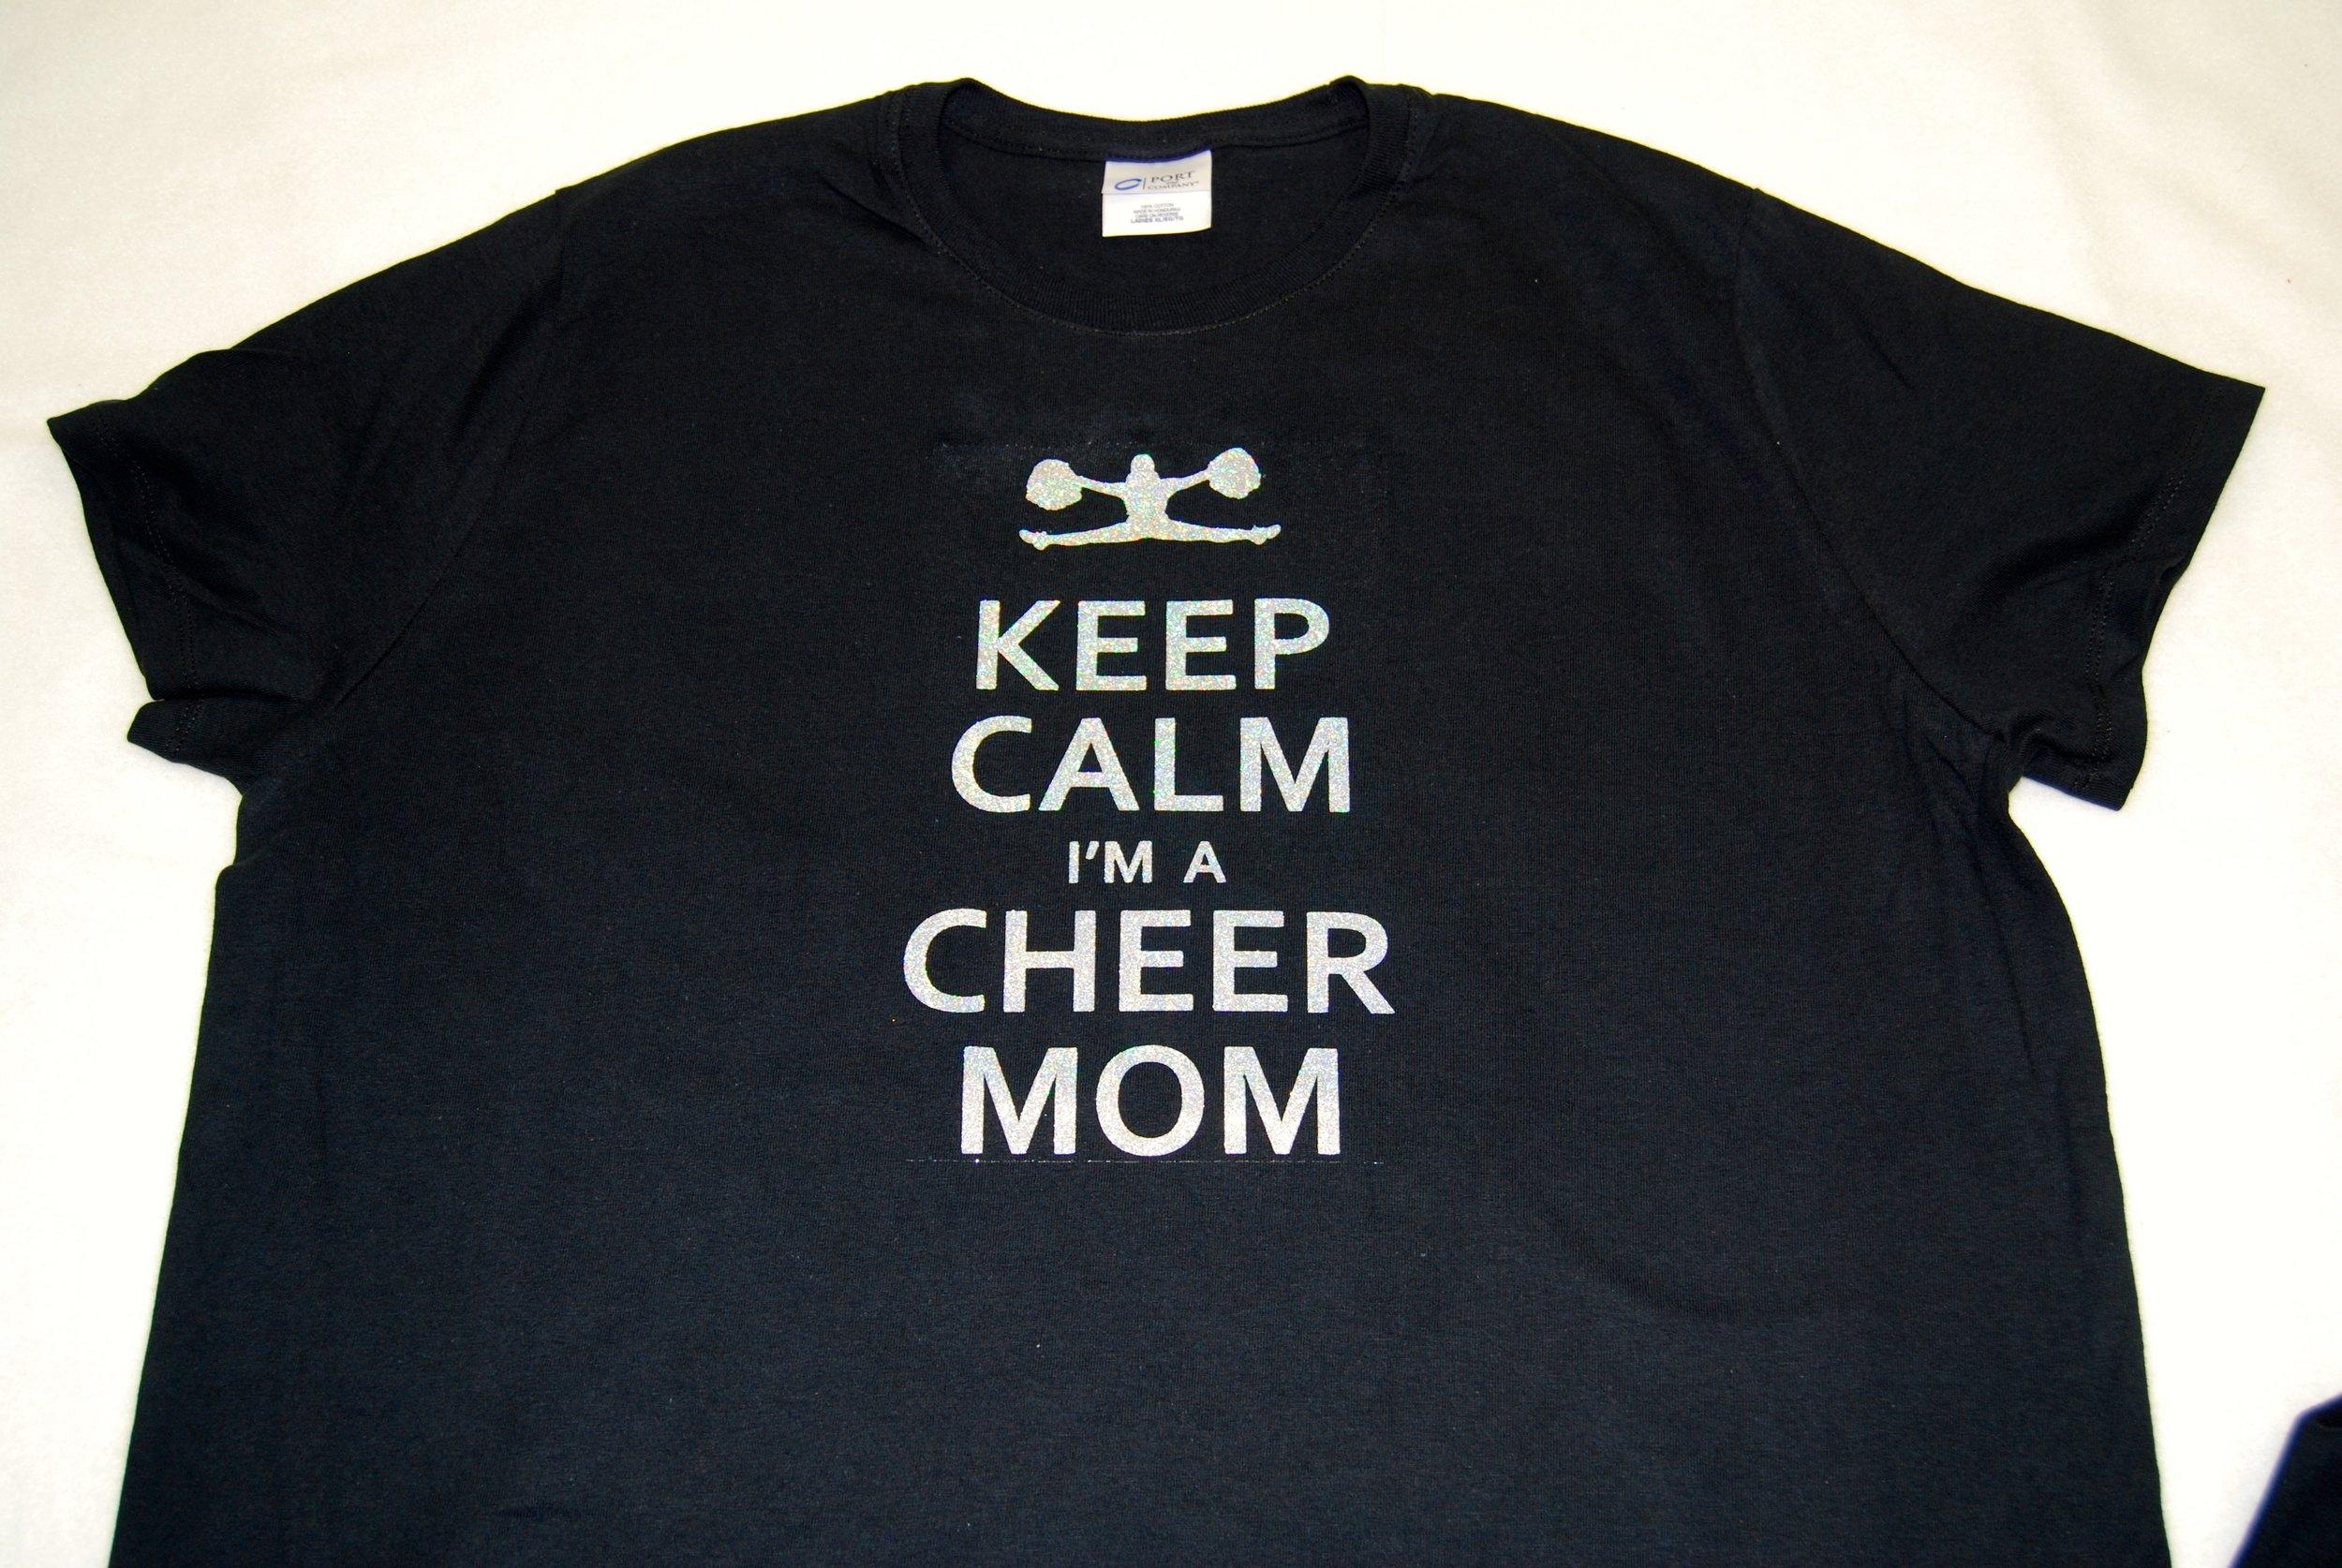 Keep Calm I'm A Cheer Mom in silver glitter